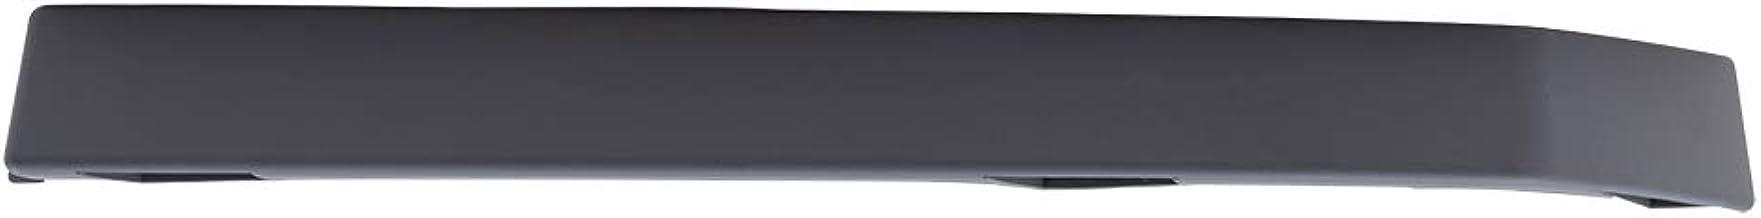 Brock Replacement Passenger Front Bumper Headlight Molding Trim Grille Filler Panel Compatible with 04-15 Titan Armada QX56